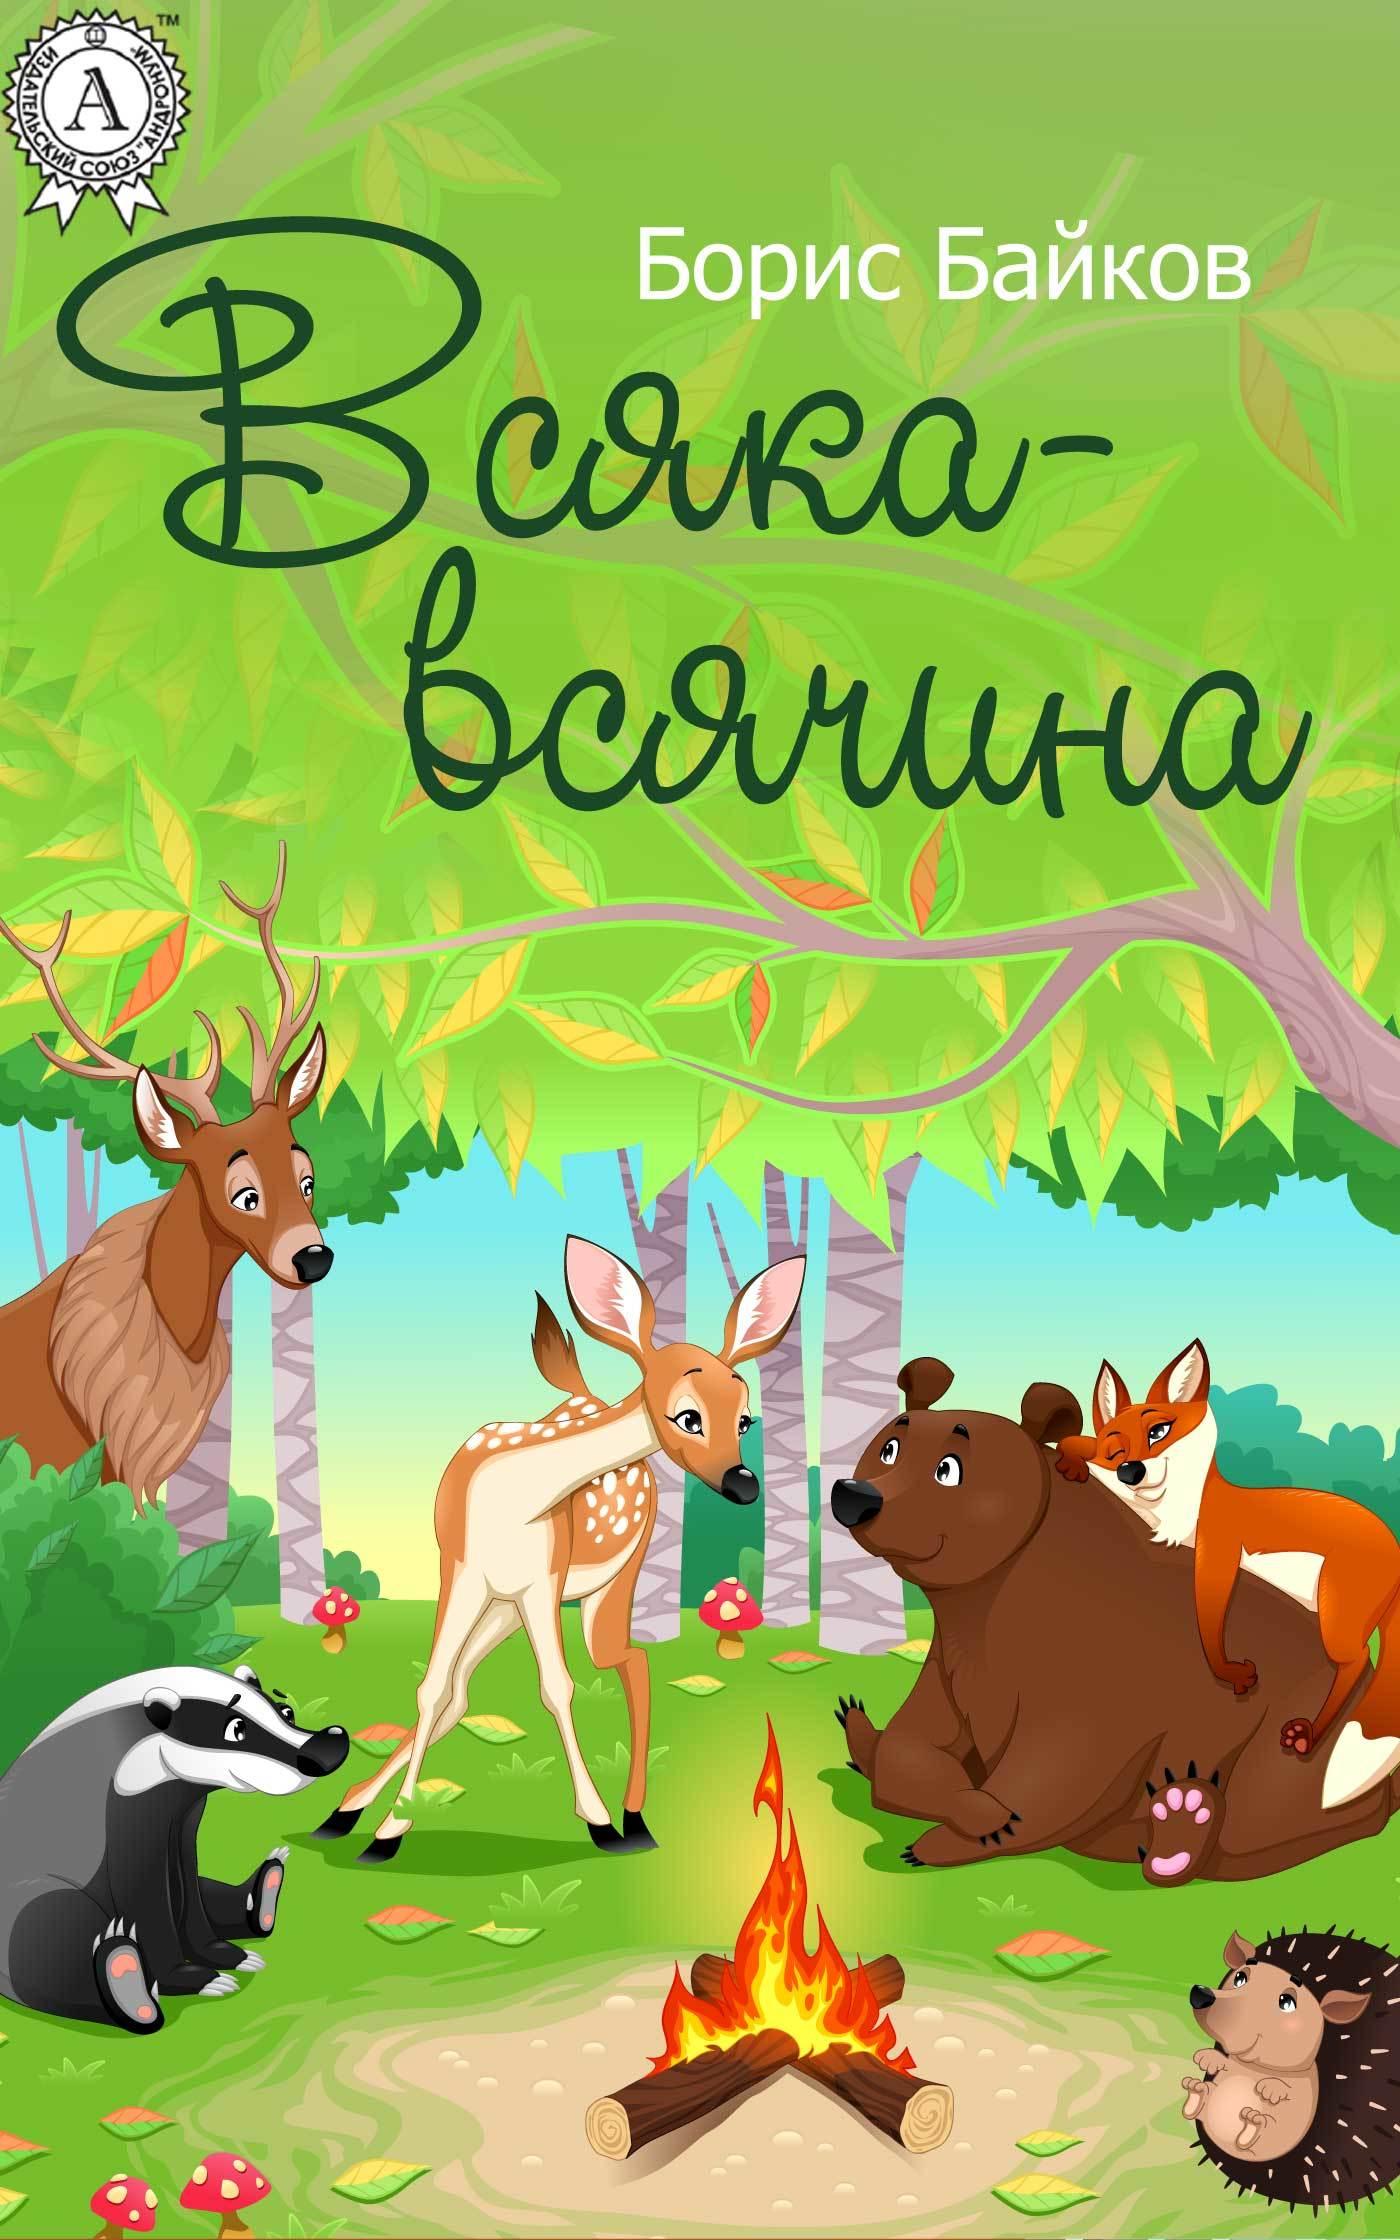 Борис Байков Всяка-всячина